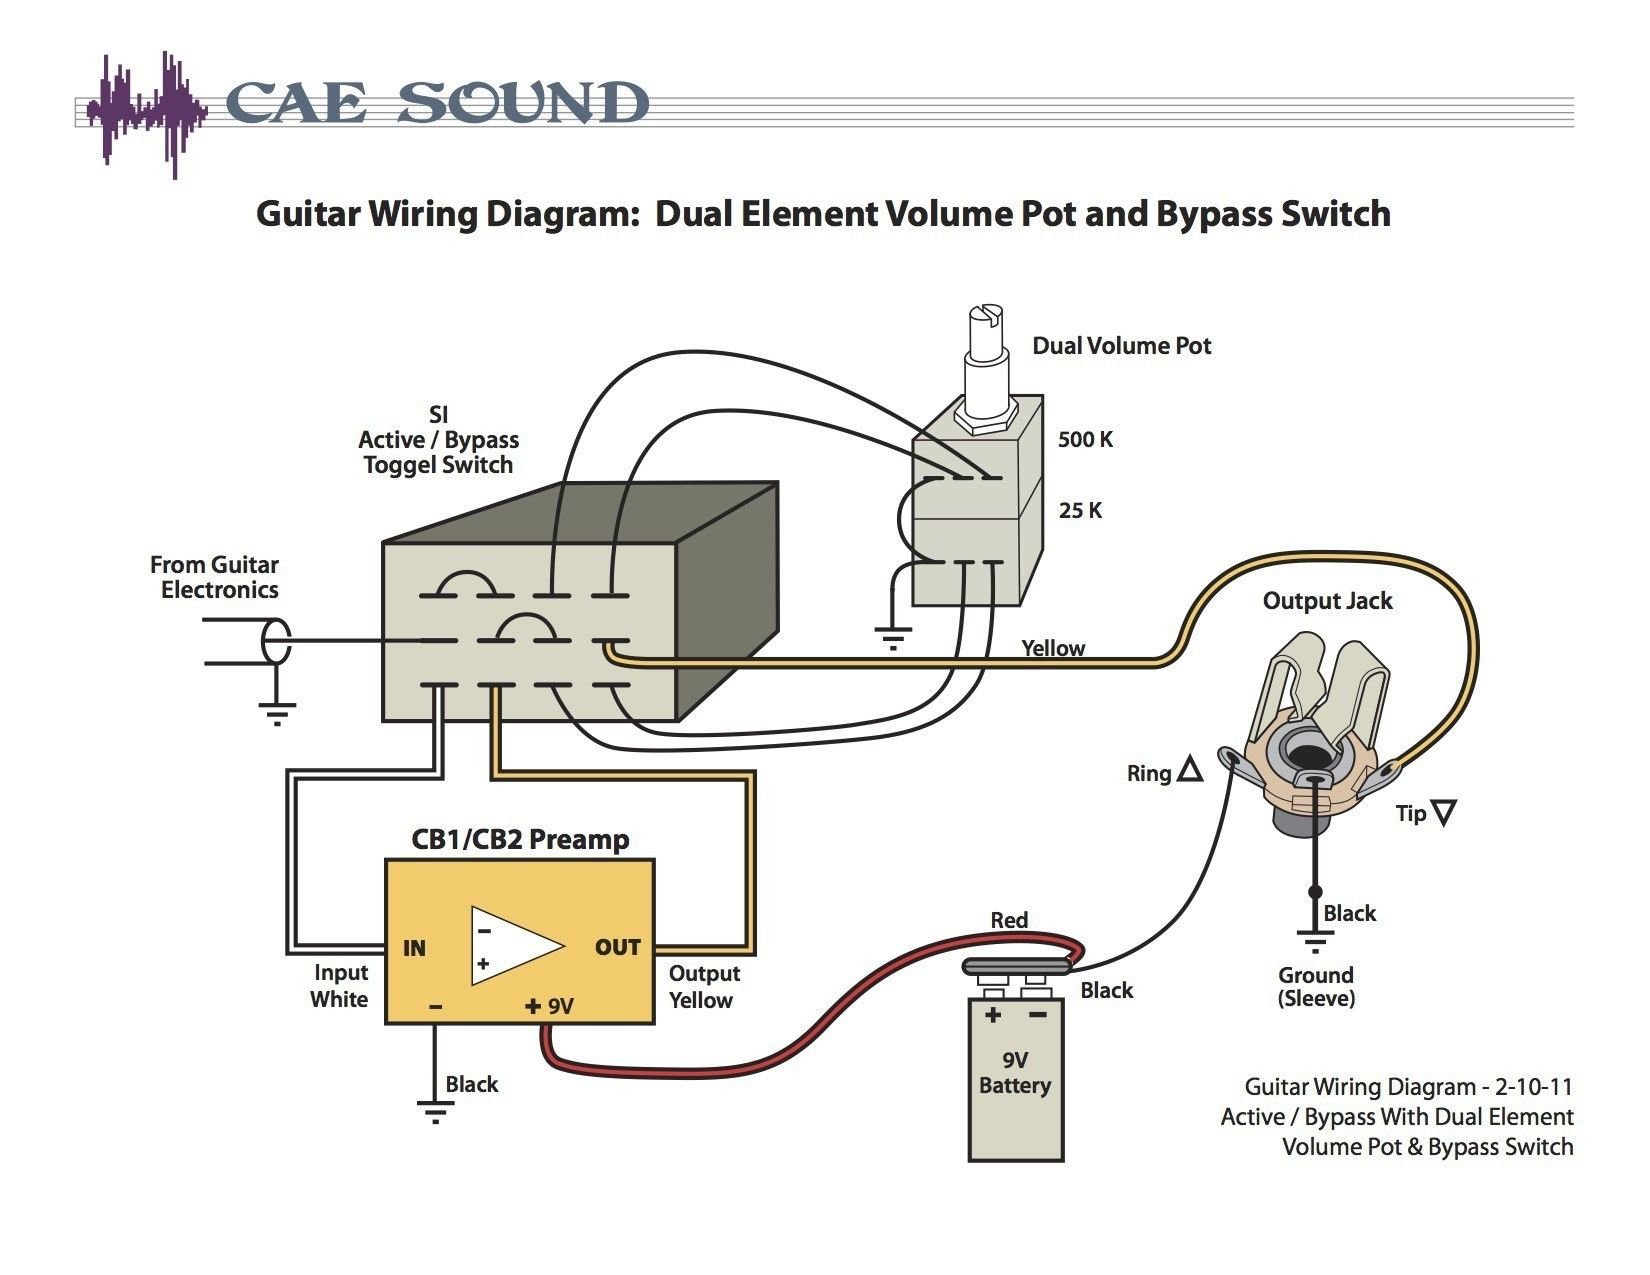 4x12 Speaker Cabinet Wiring Inspirational In 2020 Guitar Cabinet Easy Guitar Diagram